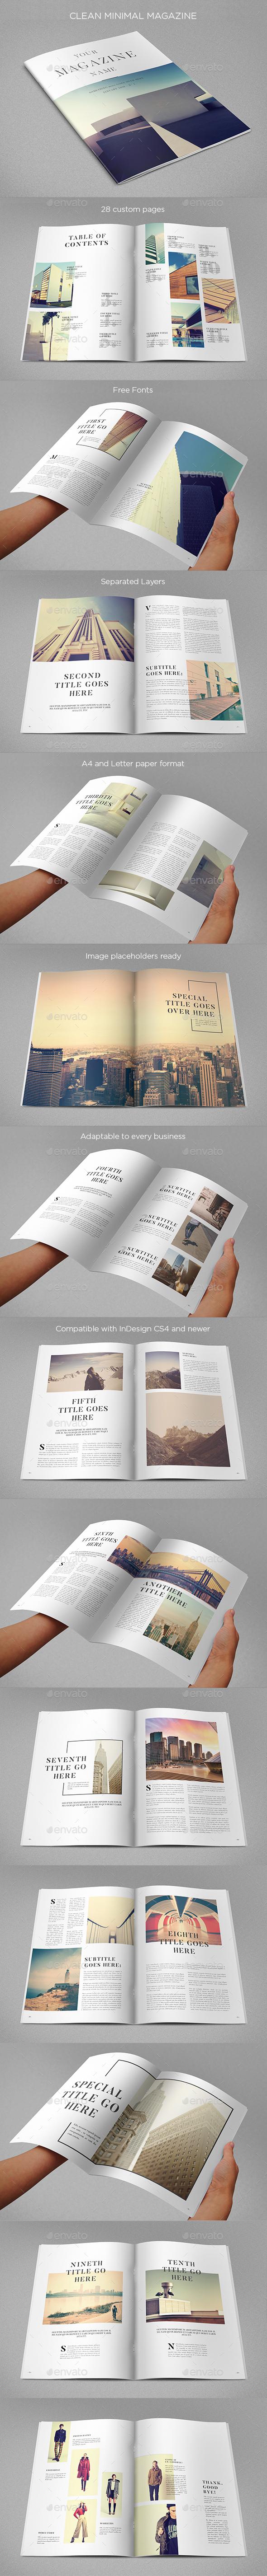 Clean Minimal Magazine - Magazines Print Templates